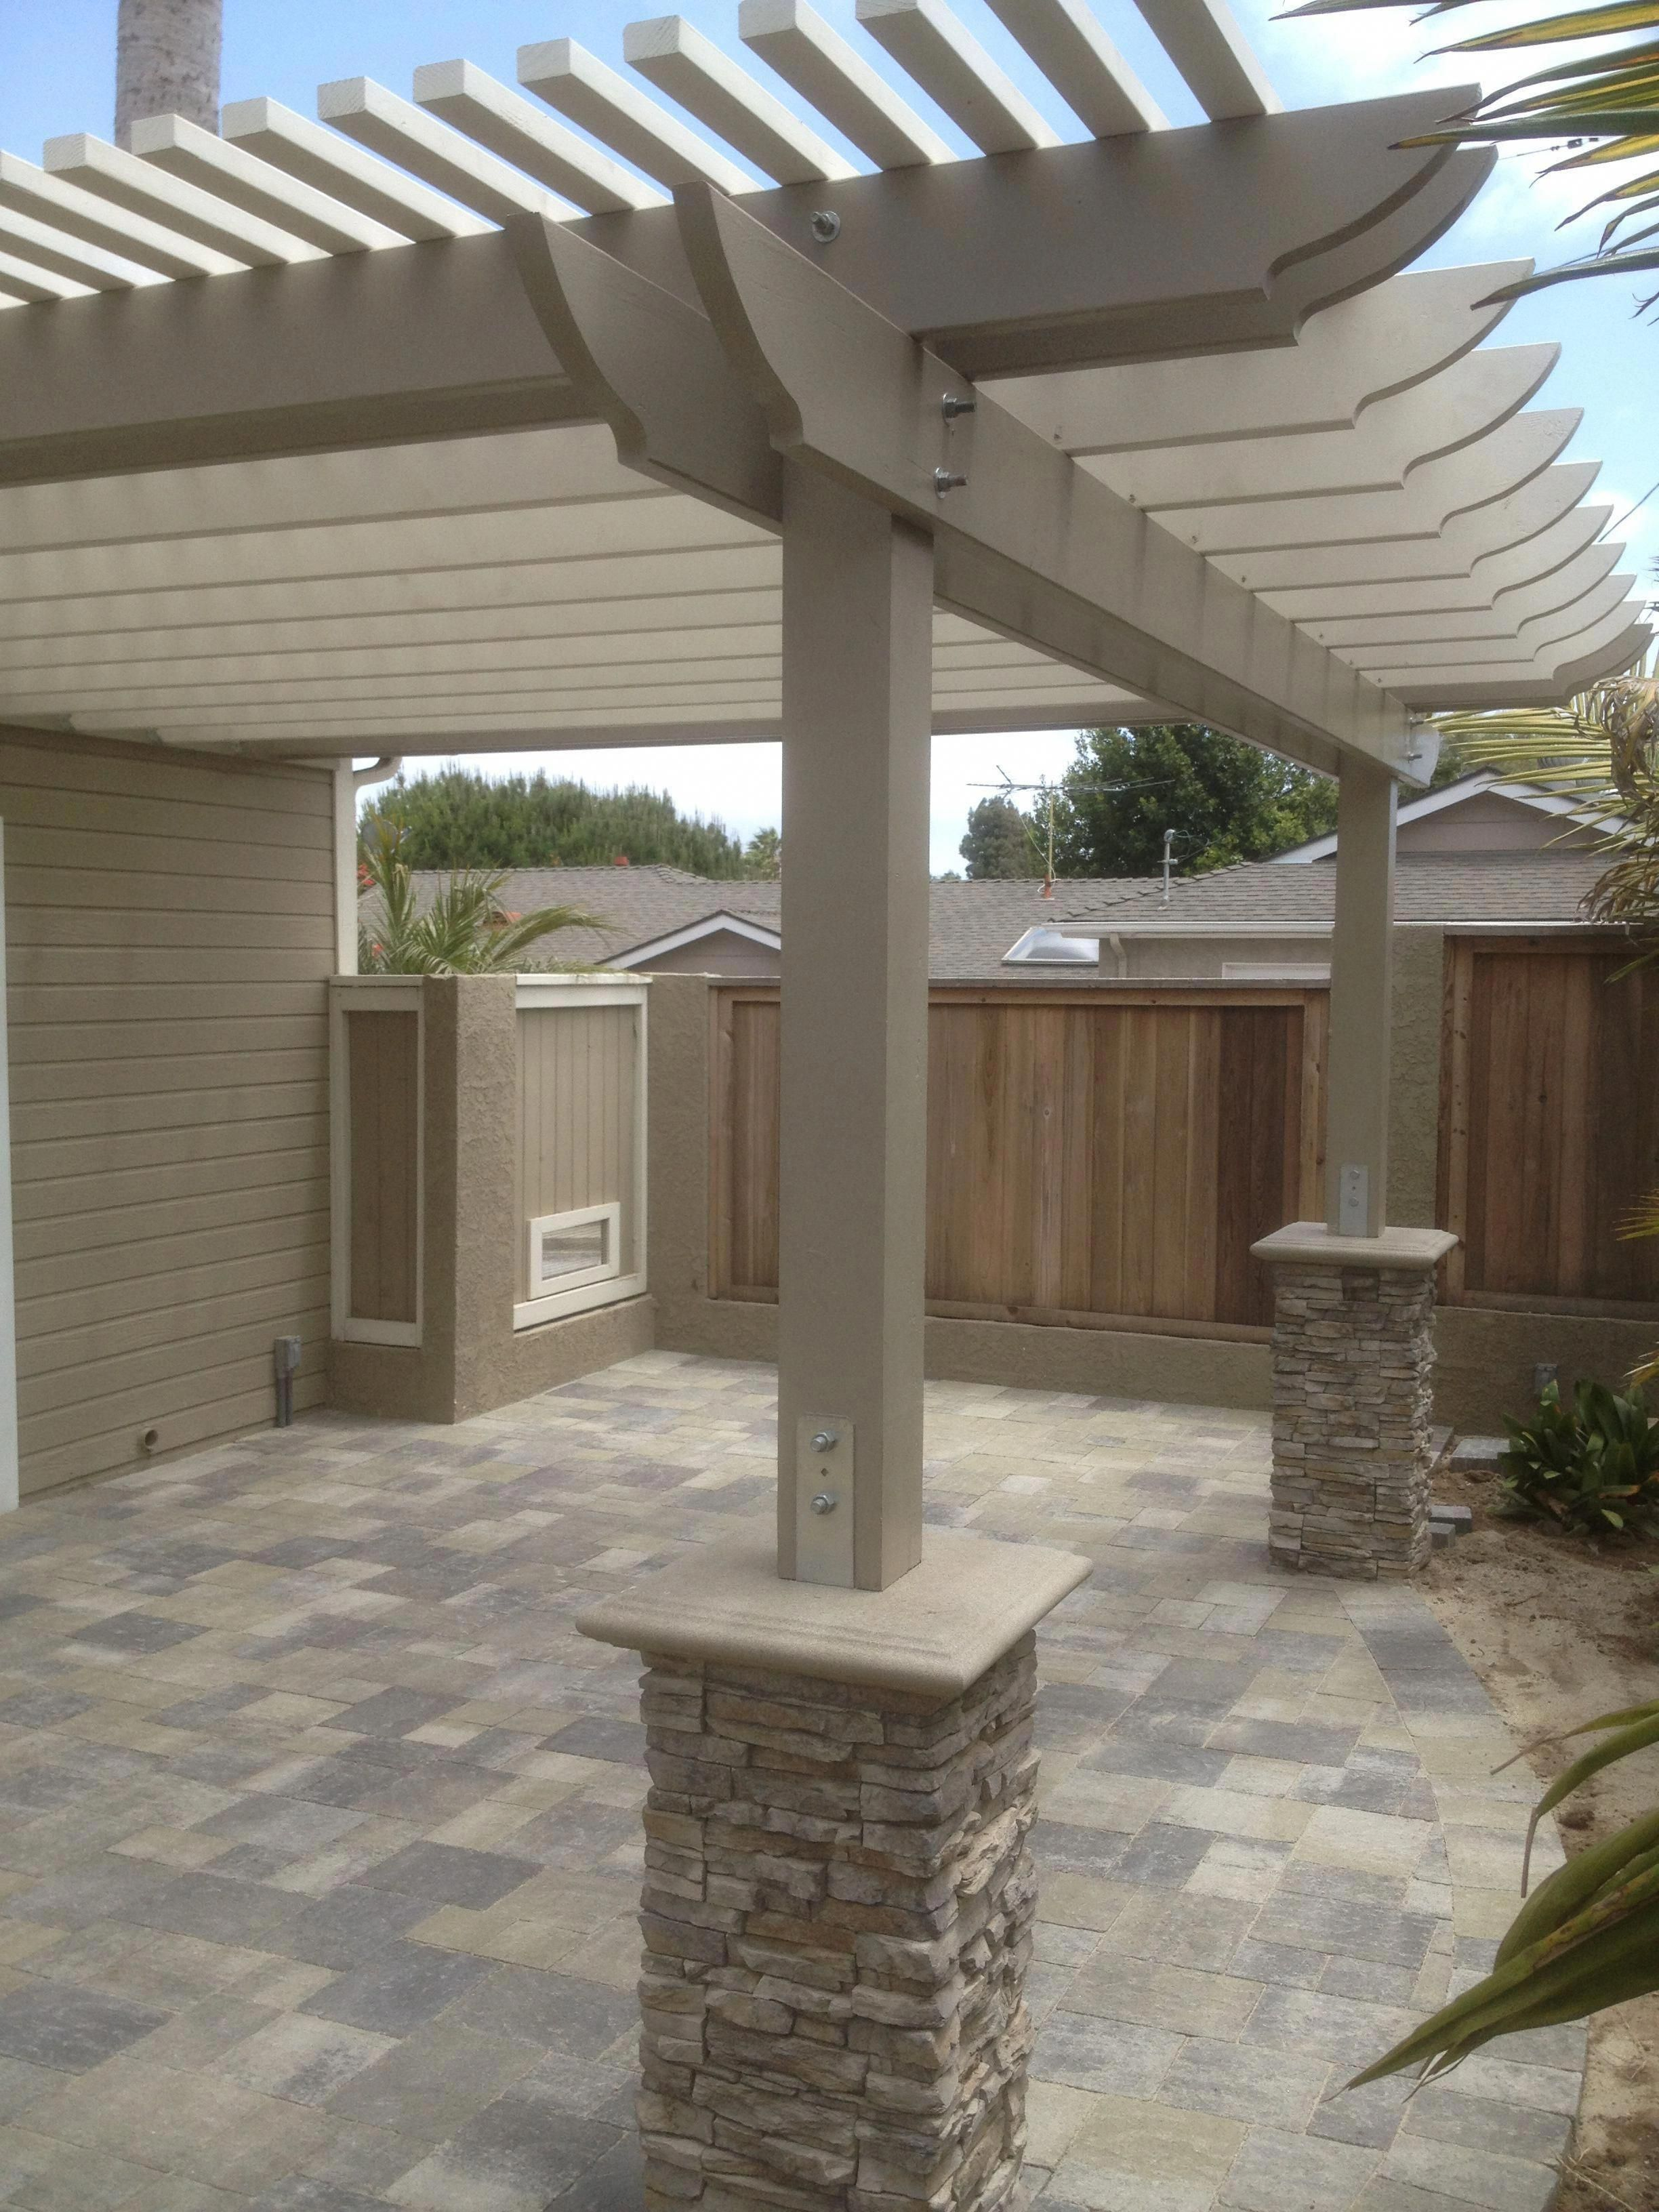 26 Patio Ideas To Beautify Your Home On A Budget Outdoor Pergola Backyard Pergola Patio Patterns Ideas